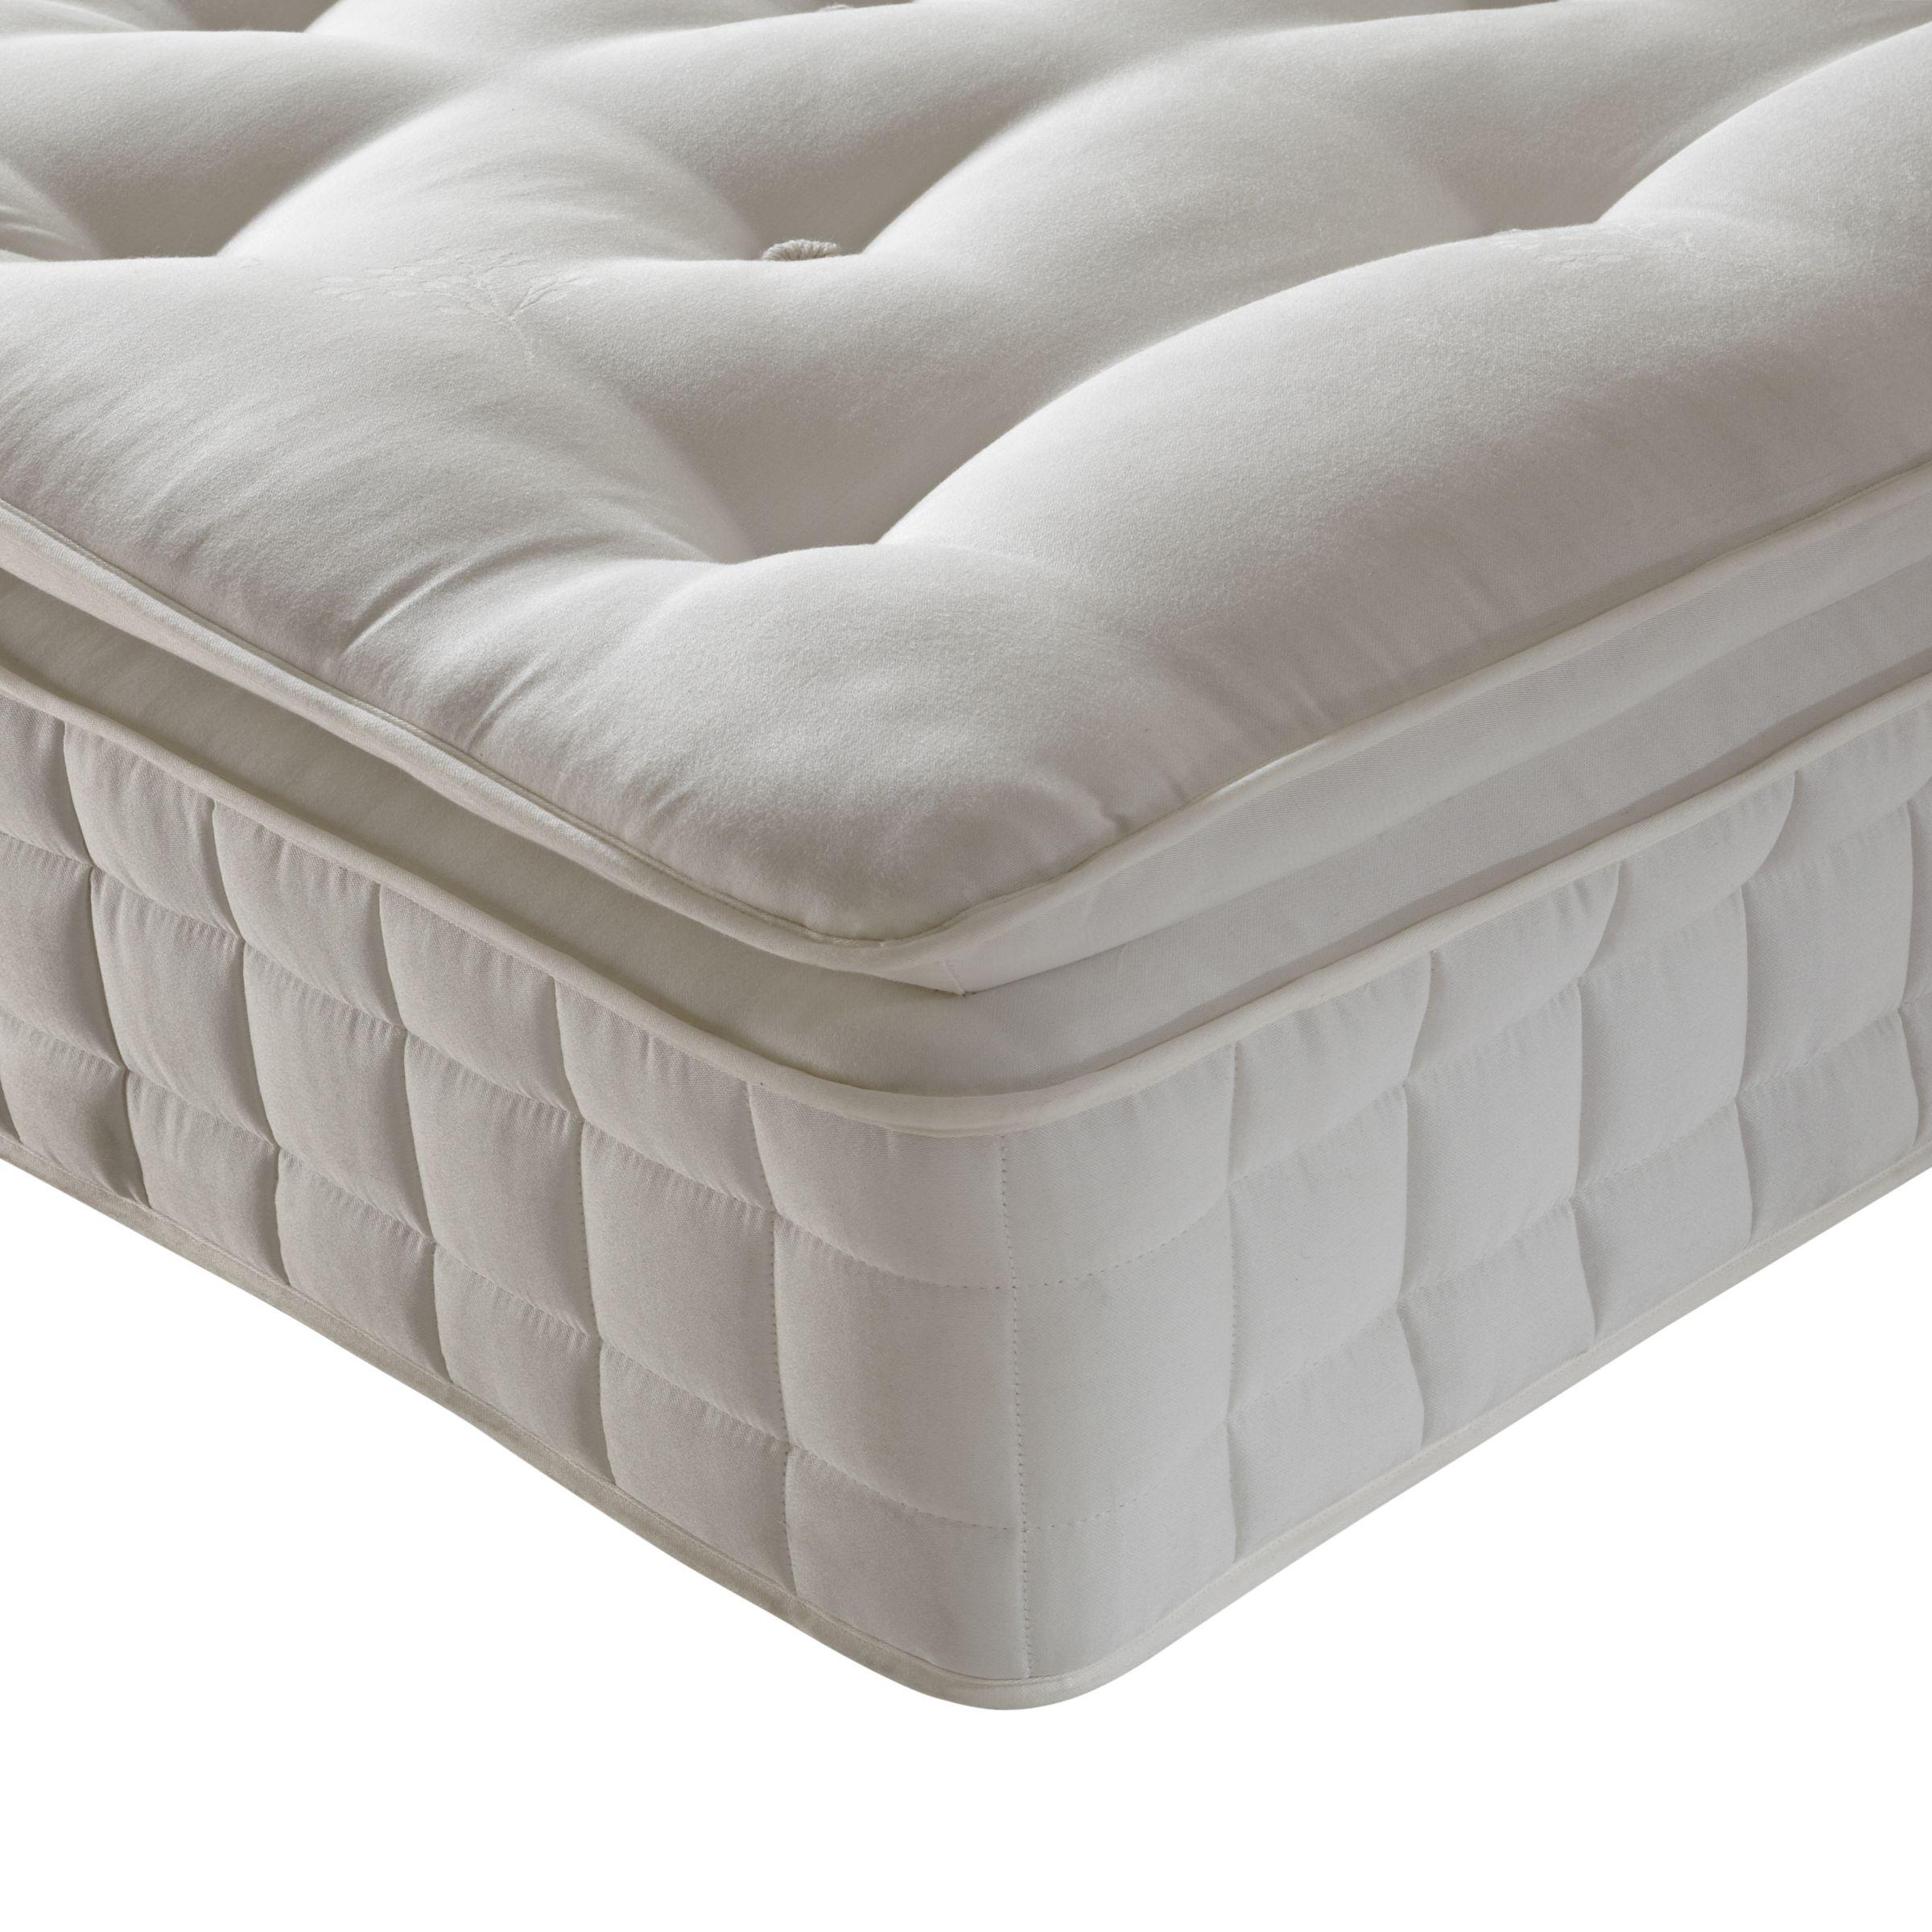 John Lewis Luxury Comfort Wool Pillowtop Mattress, Single